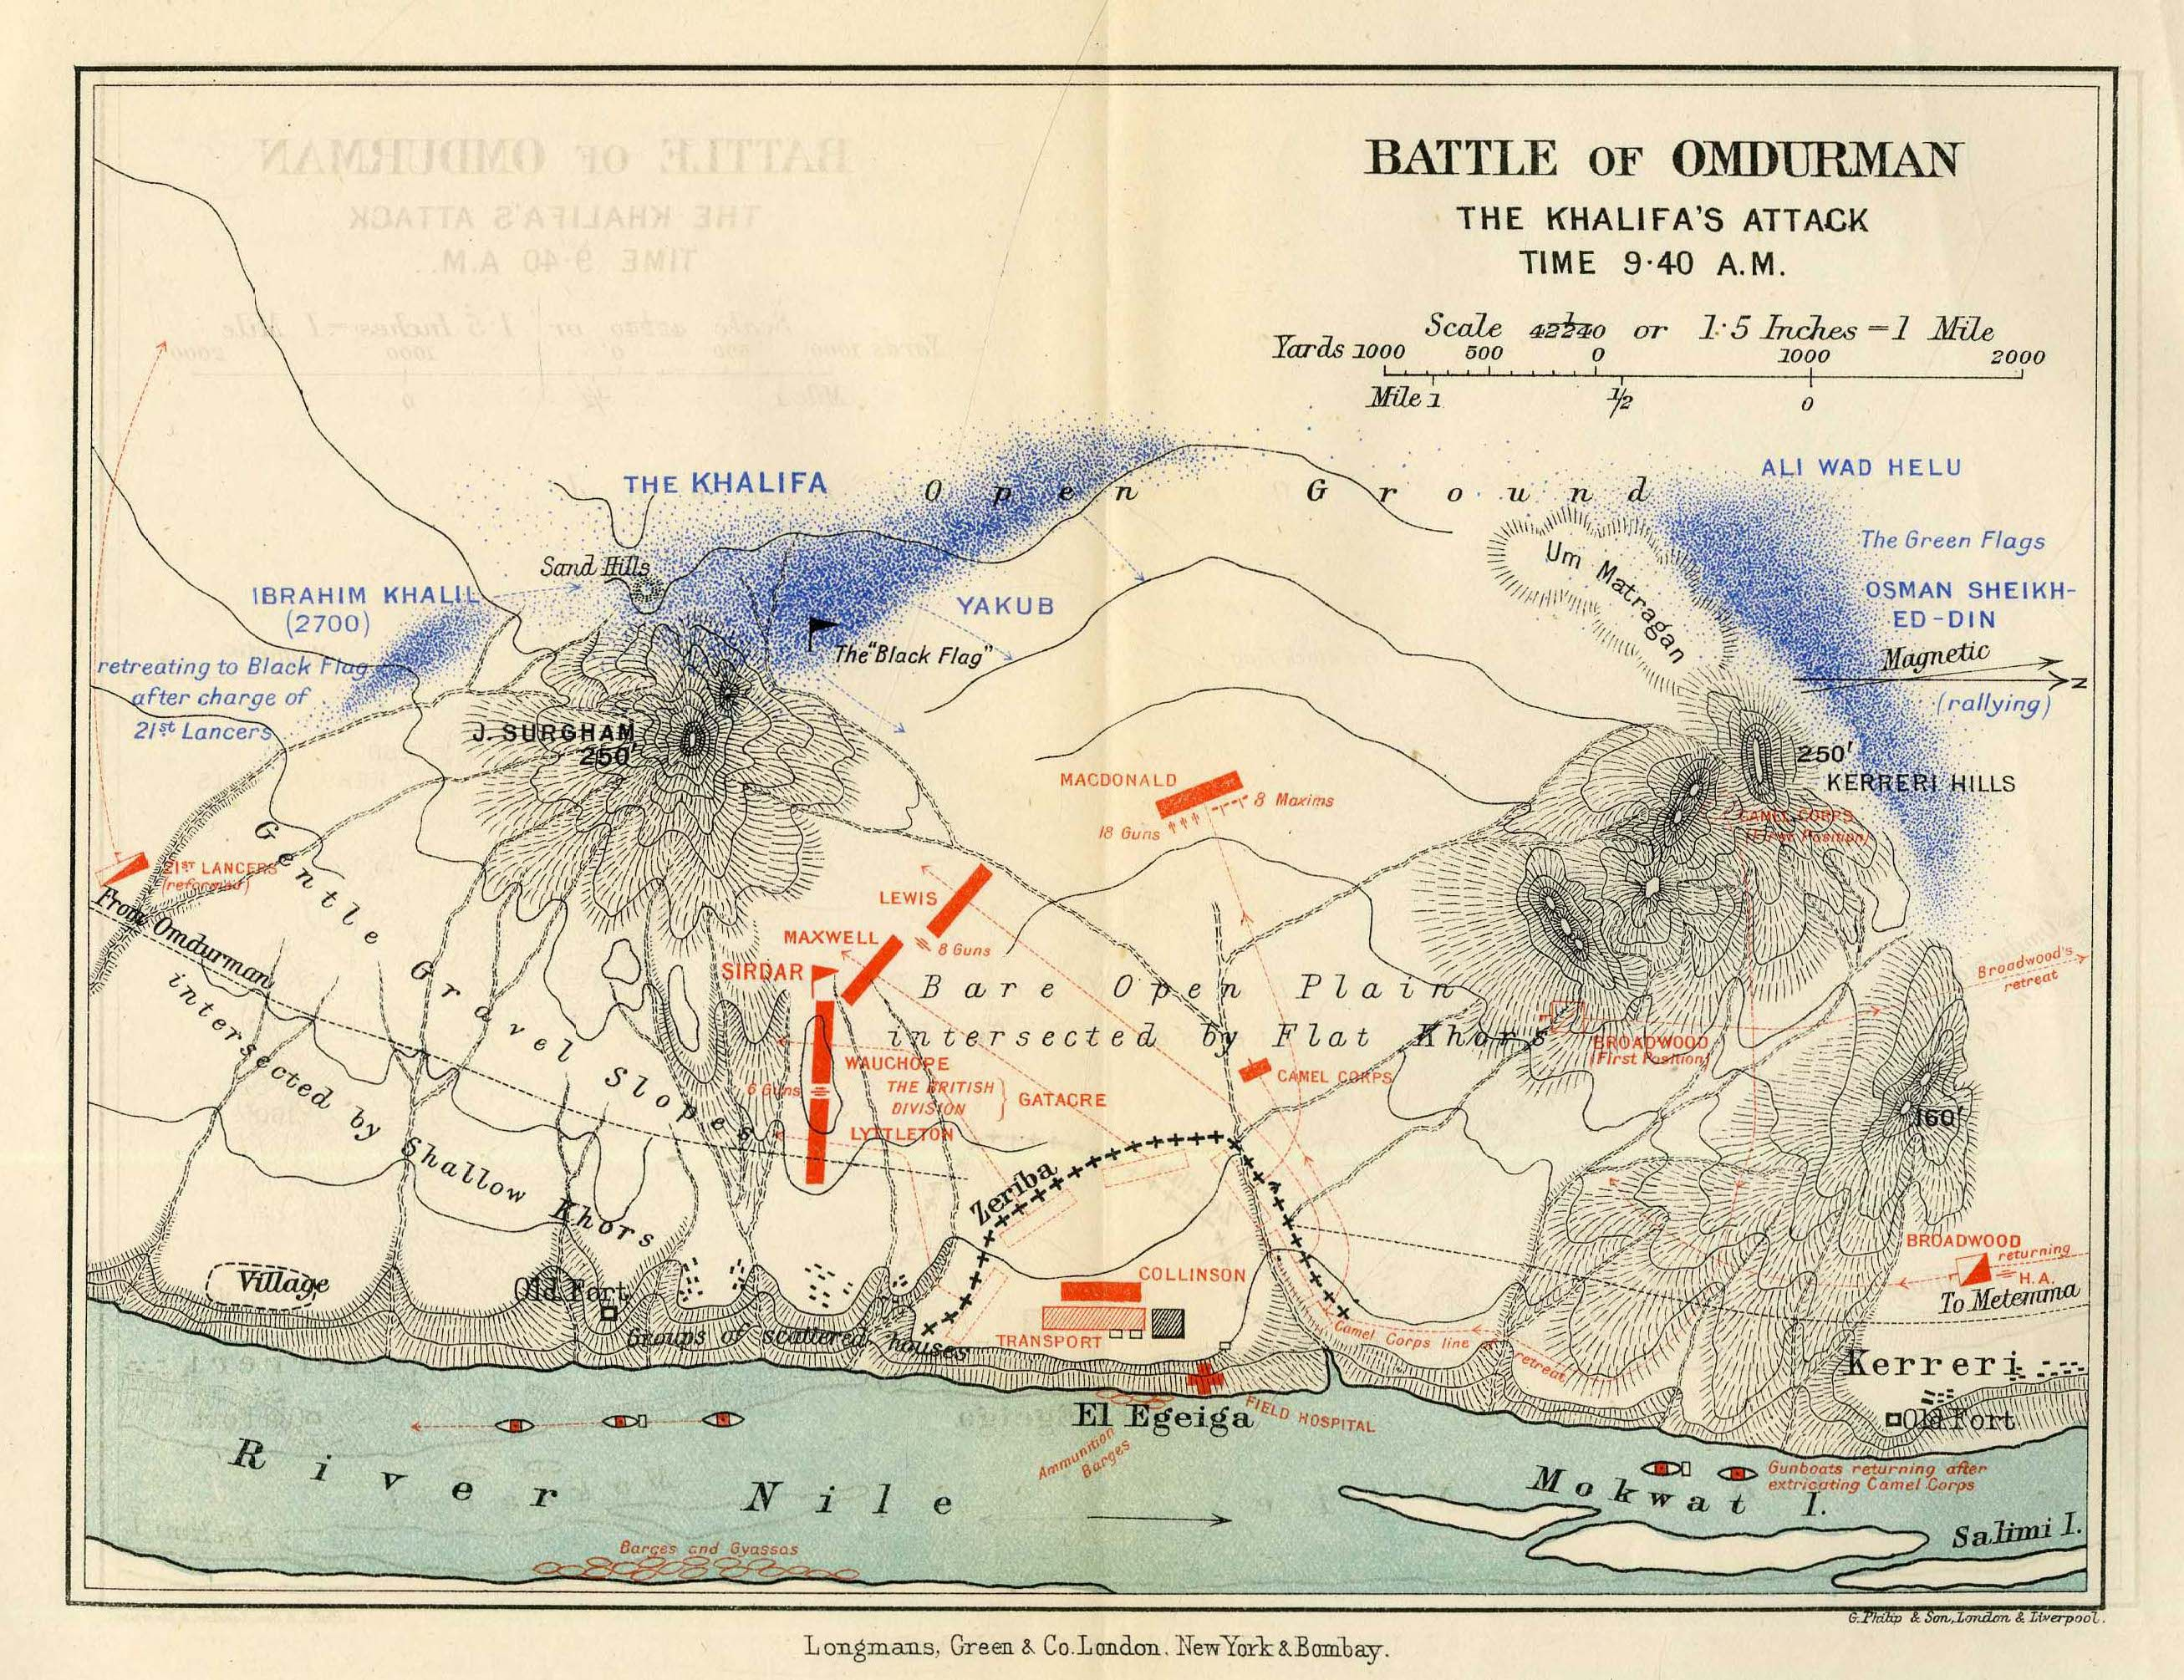 The Battle of Omdurman The Khalifas Attack 2nd September 940 am